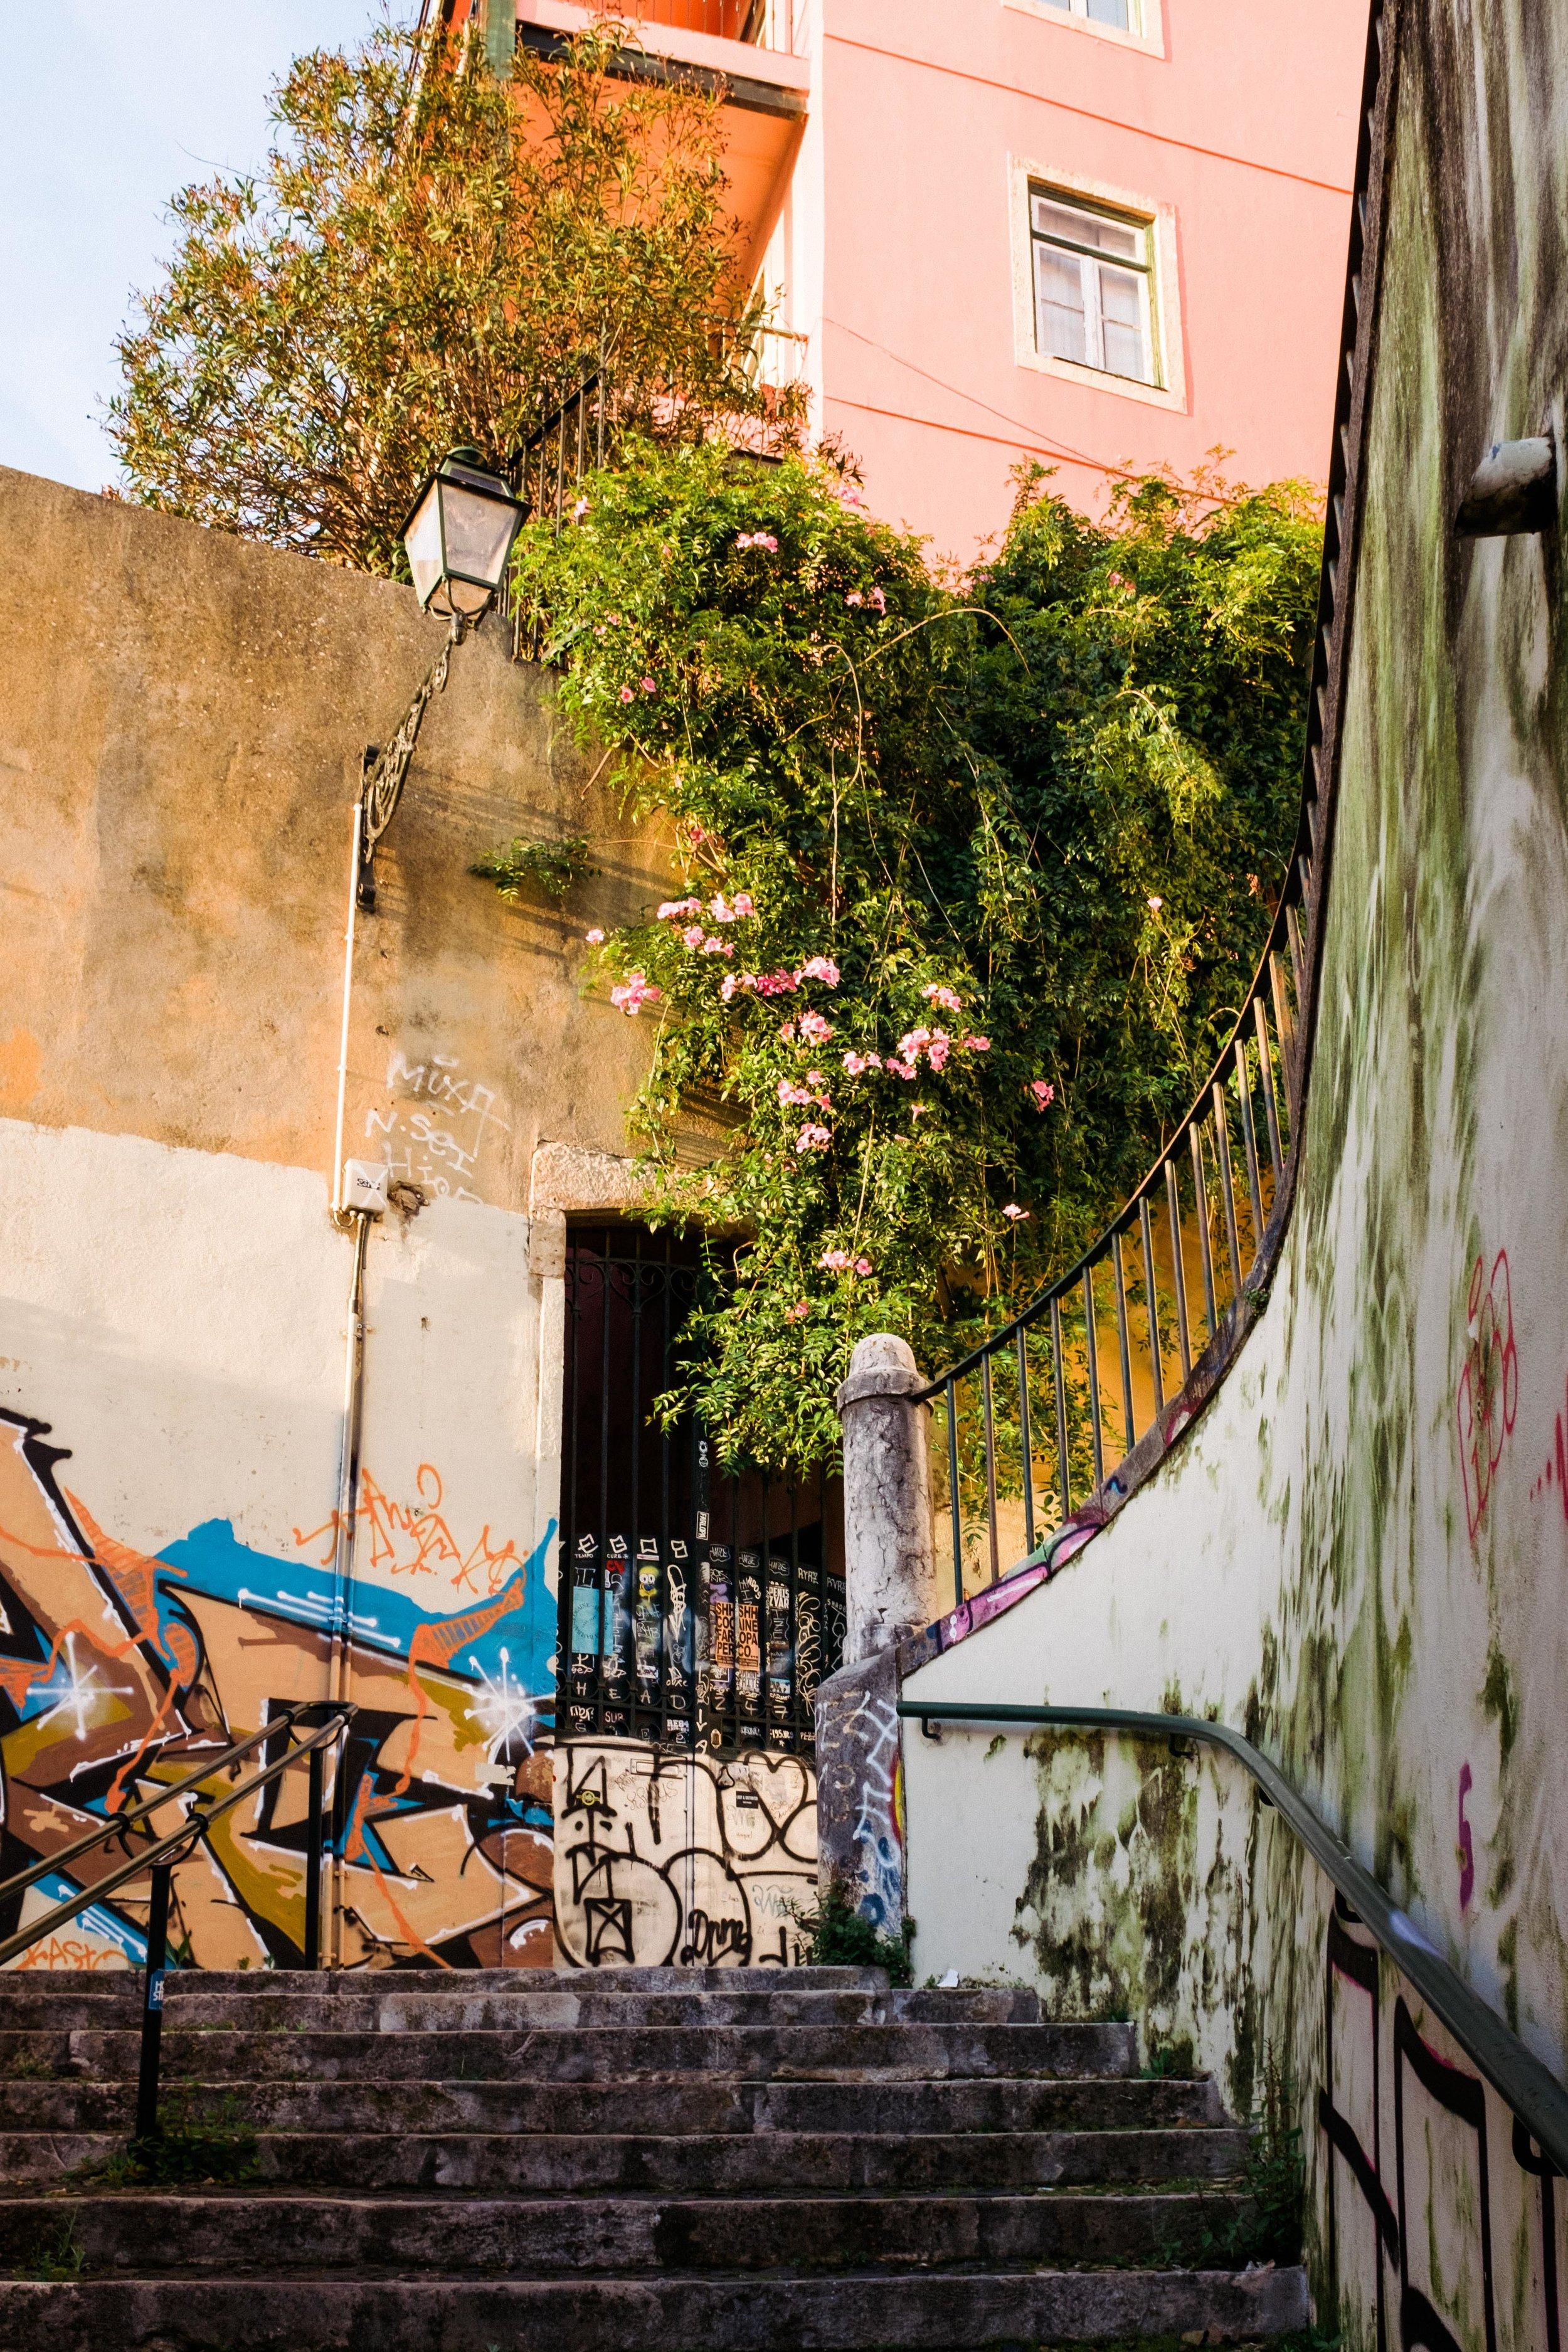 lisbon-portugal-alleyway-stairs-street-art-graffiti